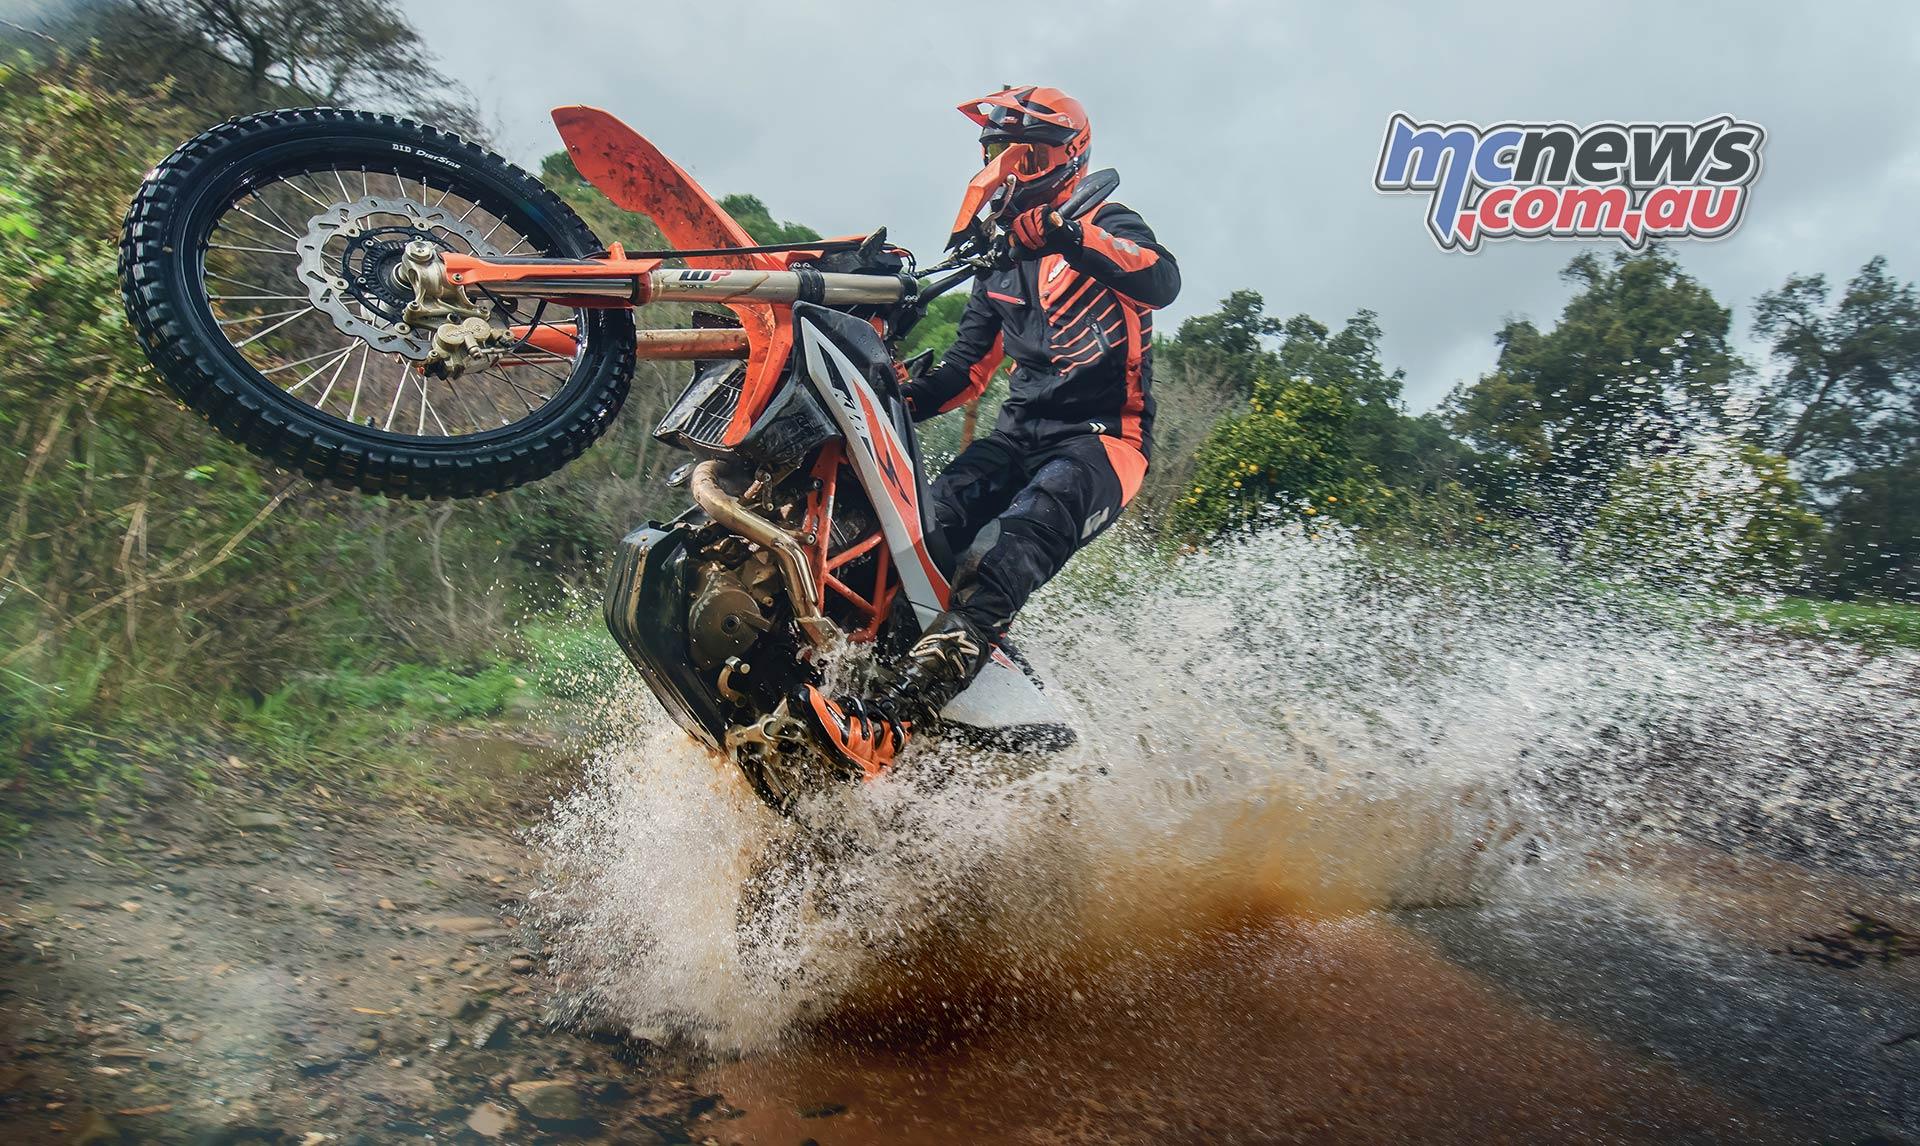 KTM Enduro R Portugal Action Spectacular